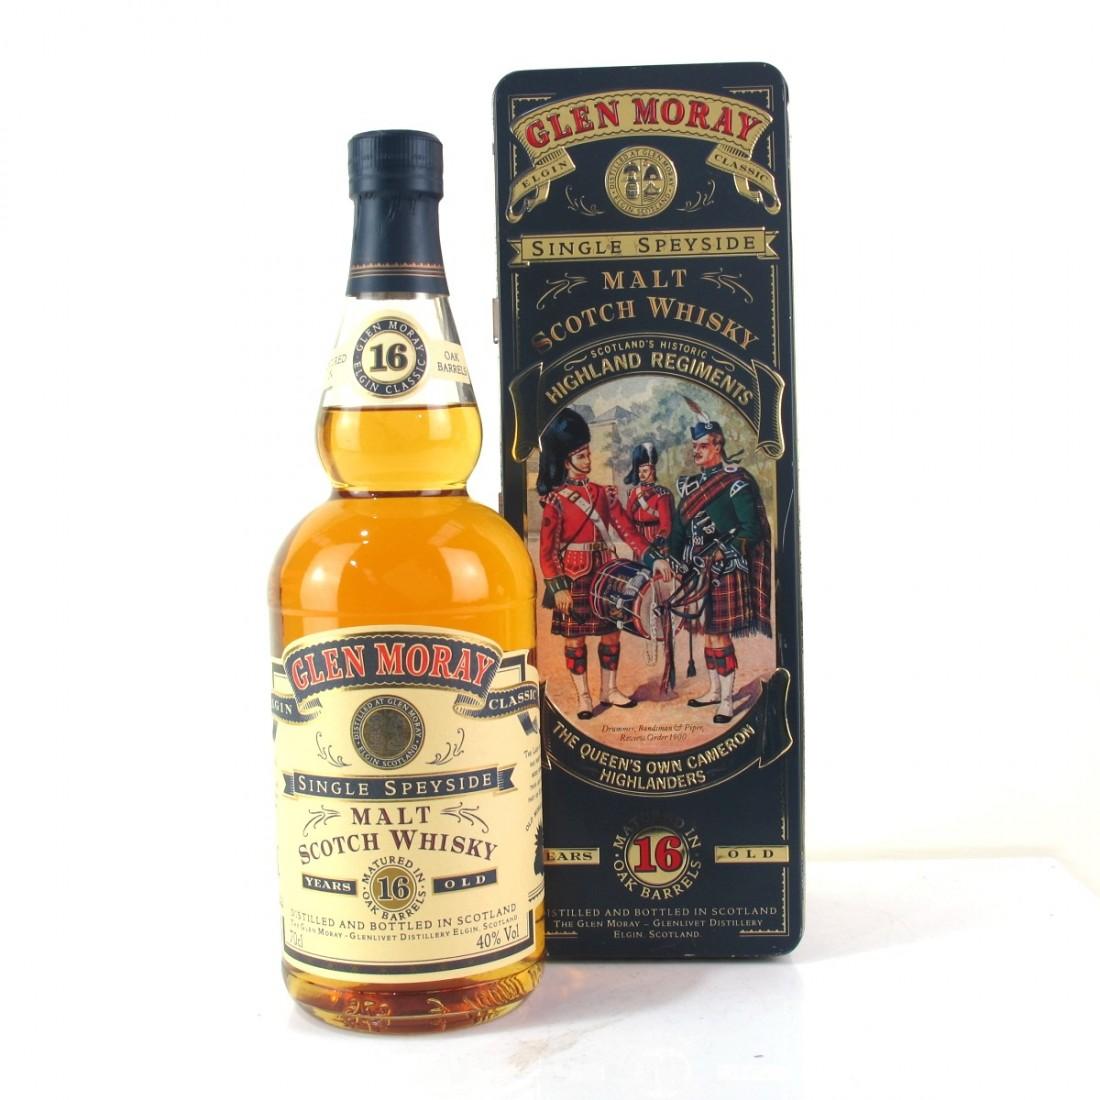 Glen Moray 16 Year Old / Queen's Own Cameron Highlanders